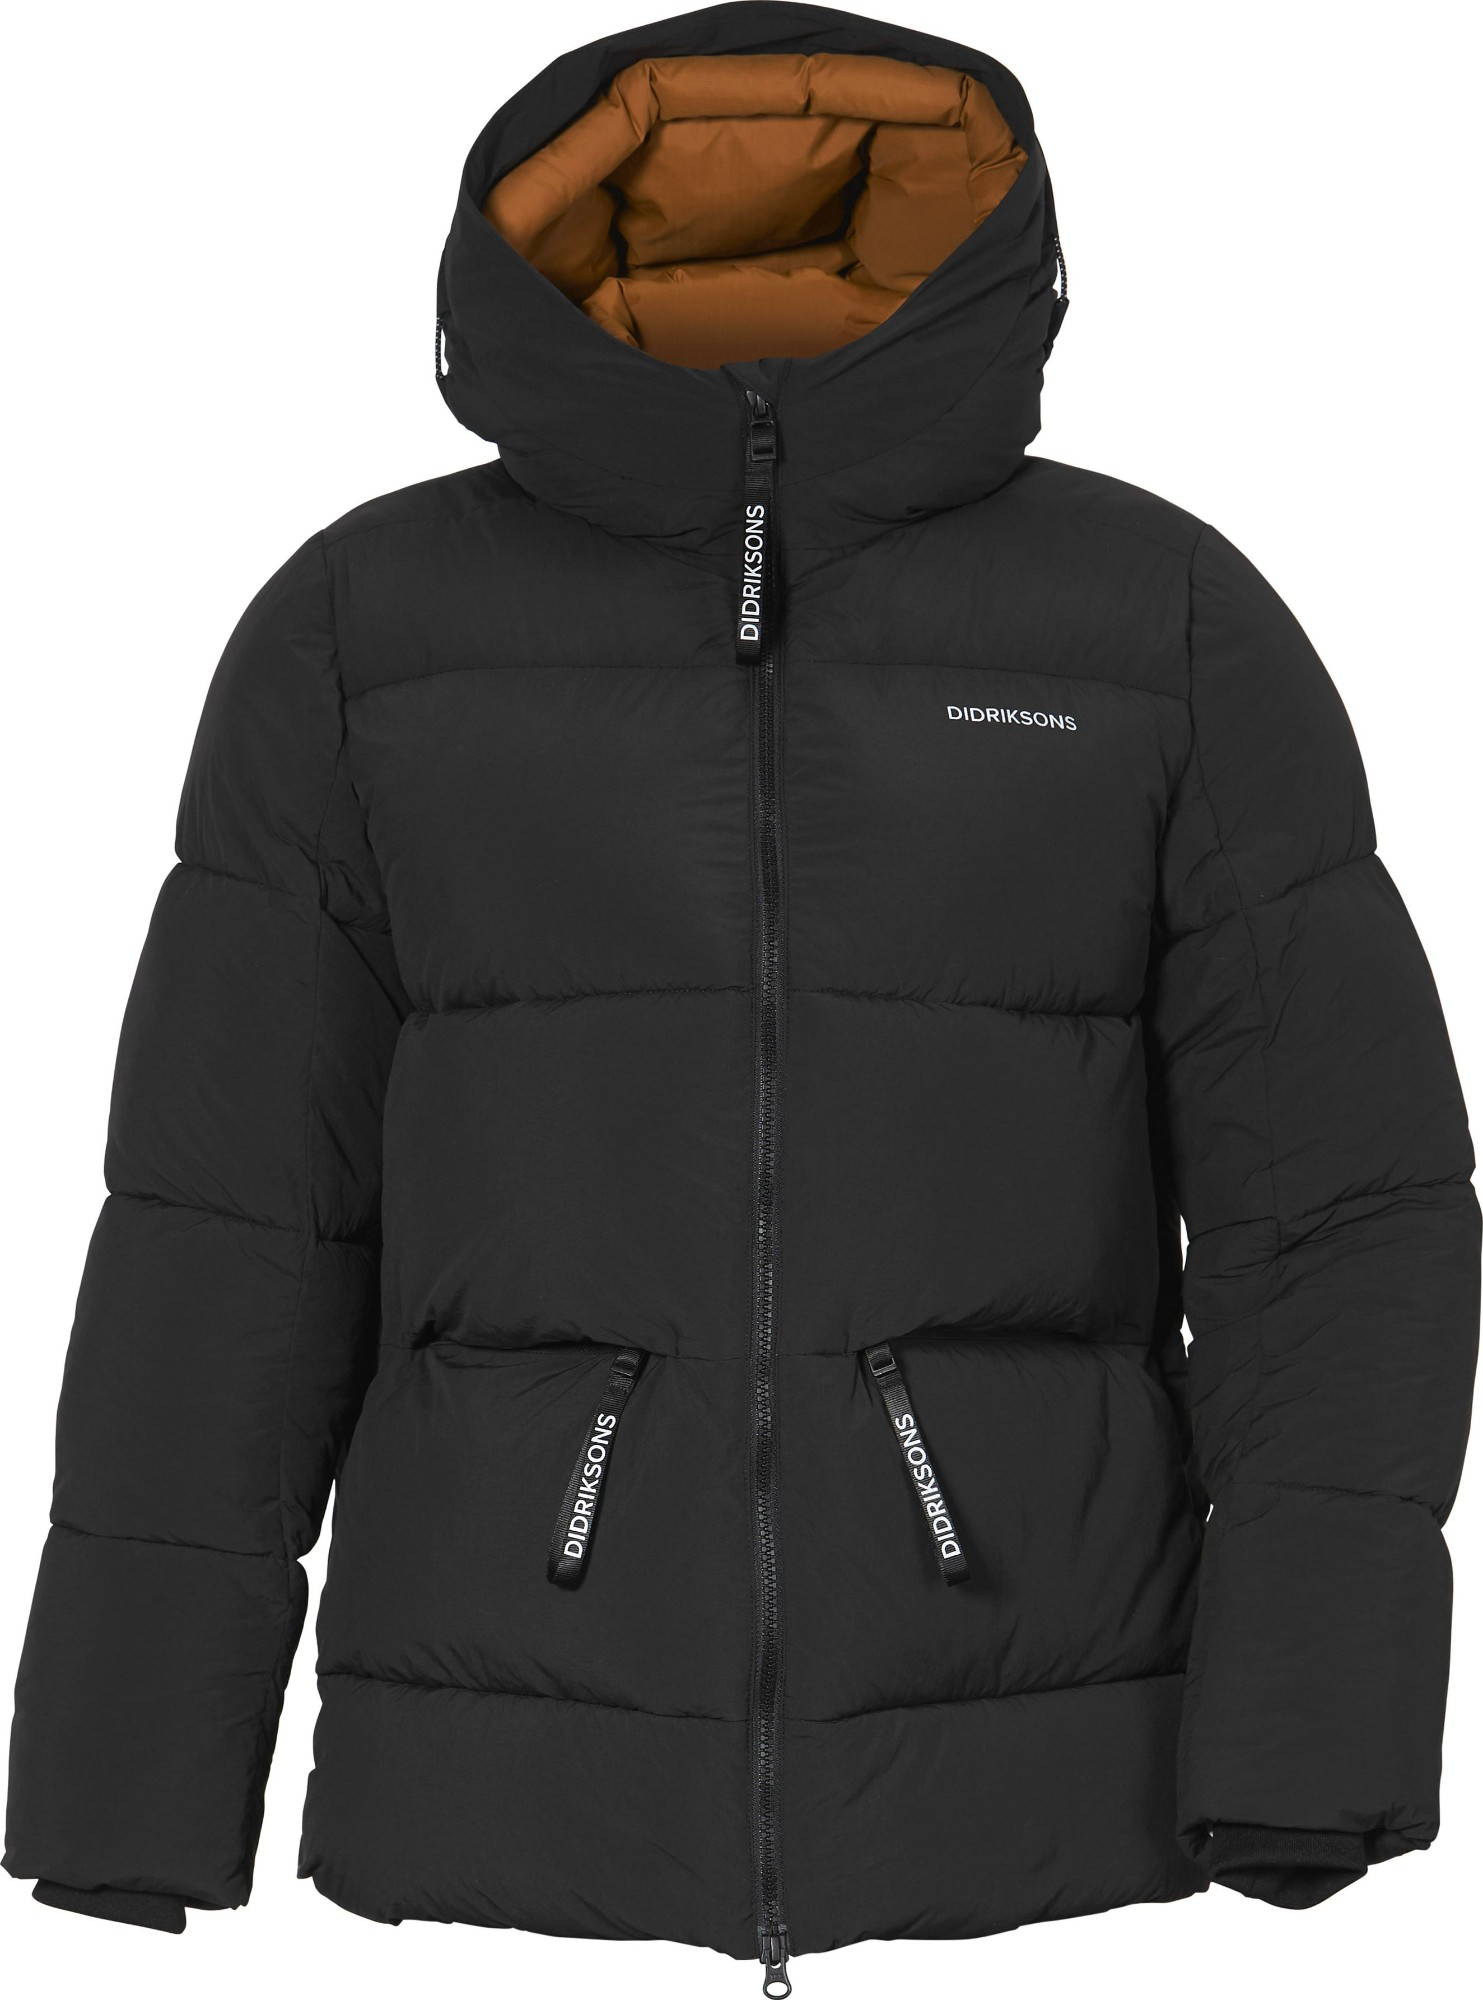 DIDRIKSONS Nomi Women's Jacket Black EU32/34